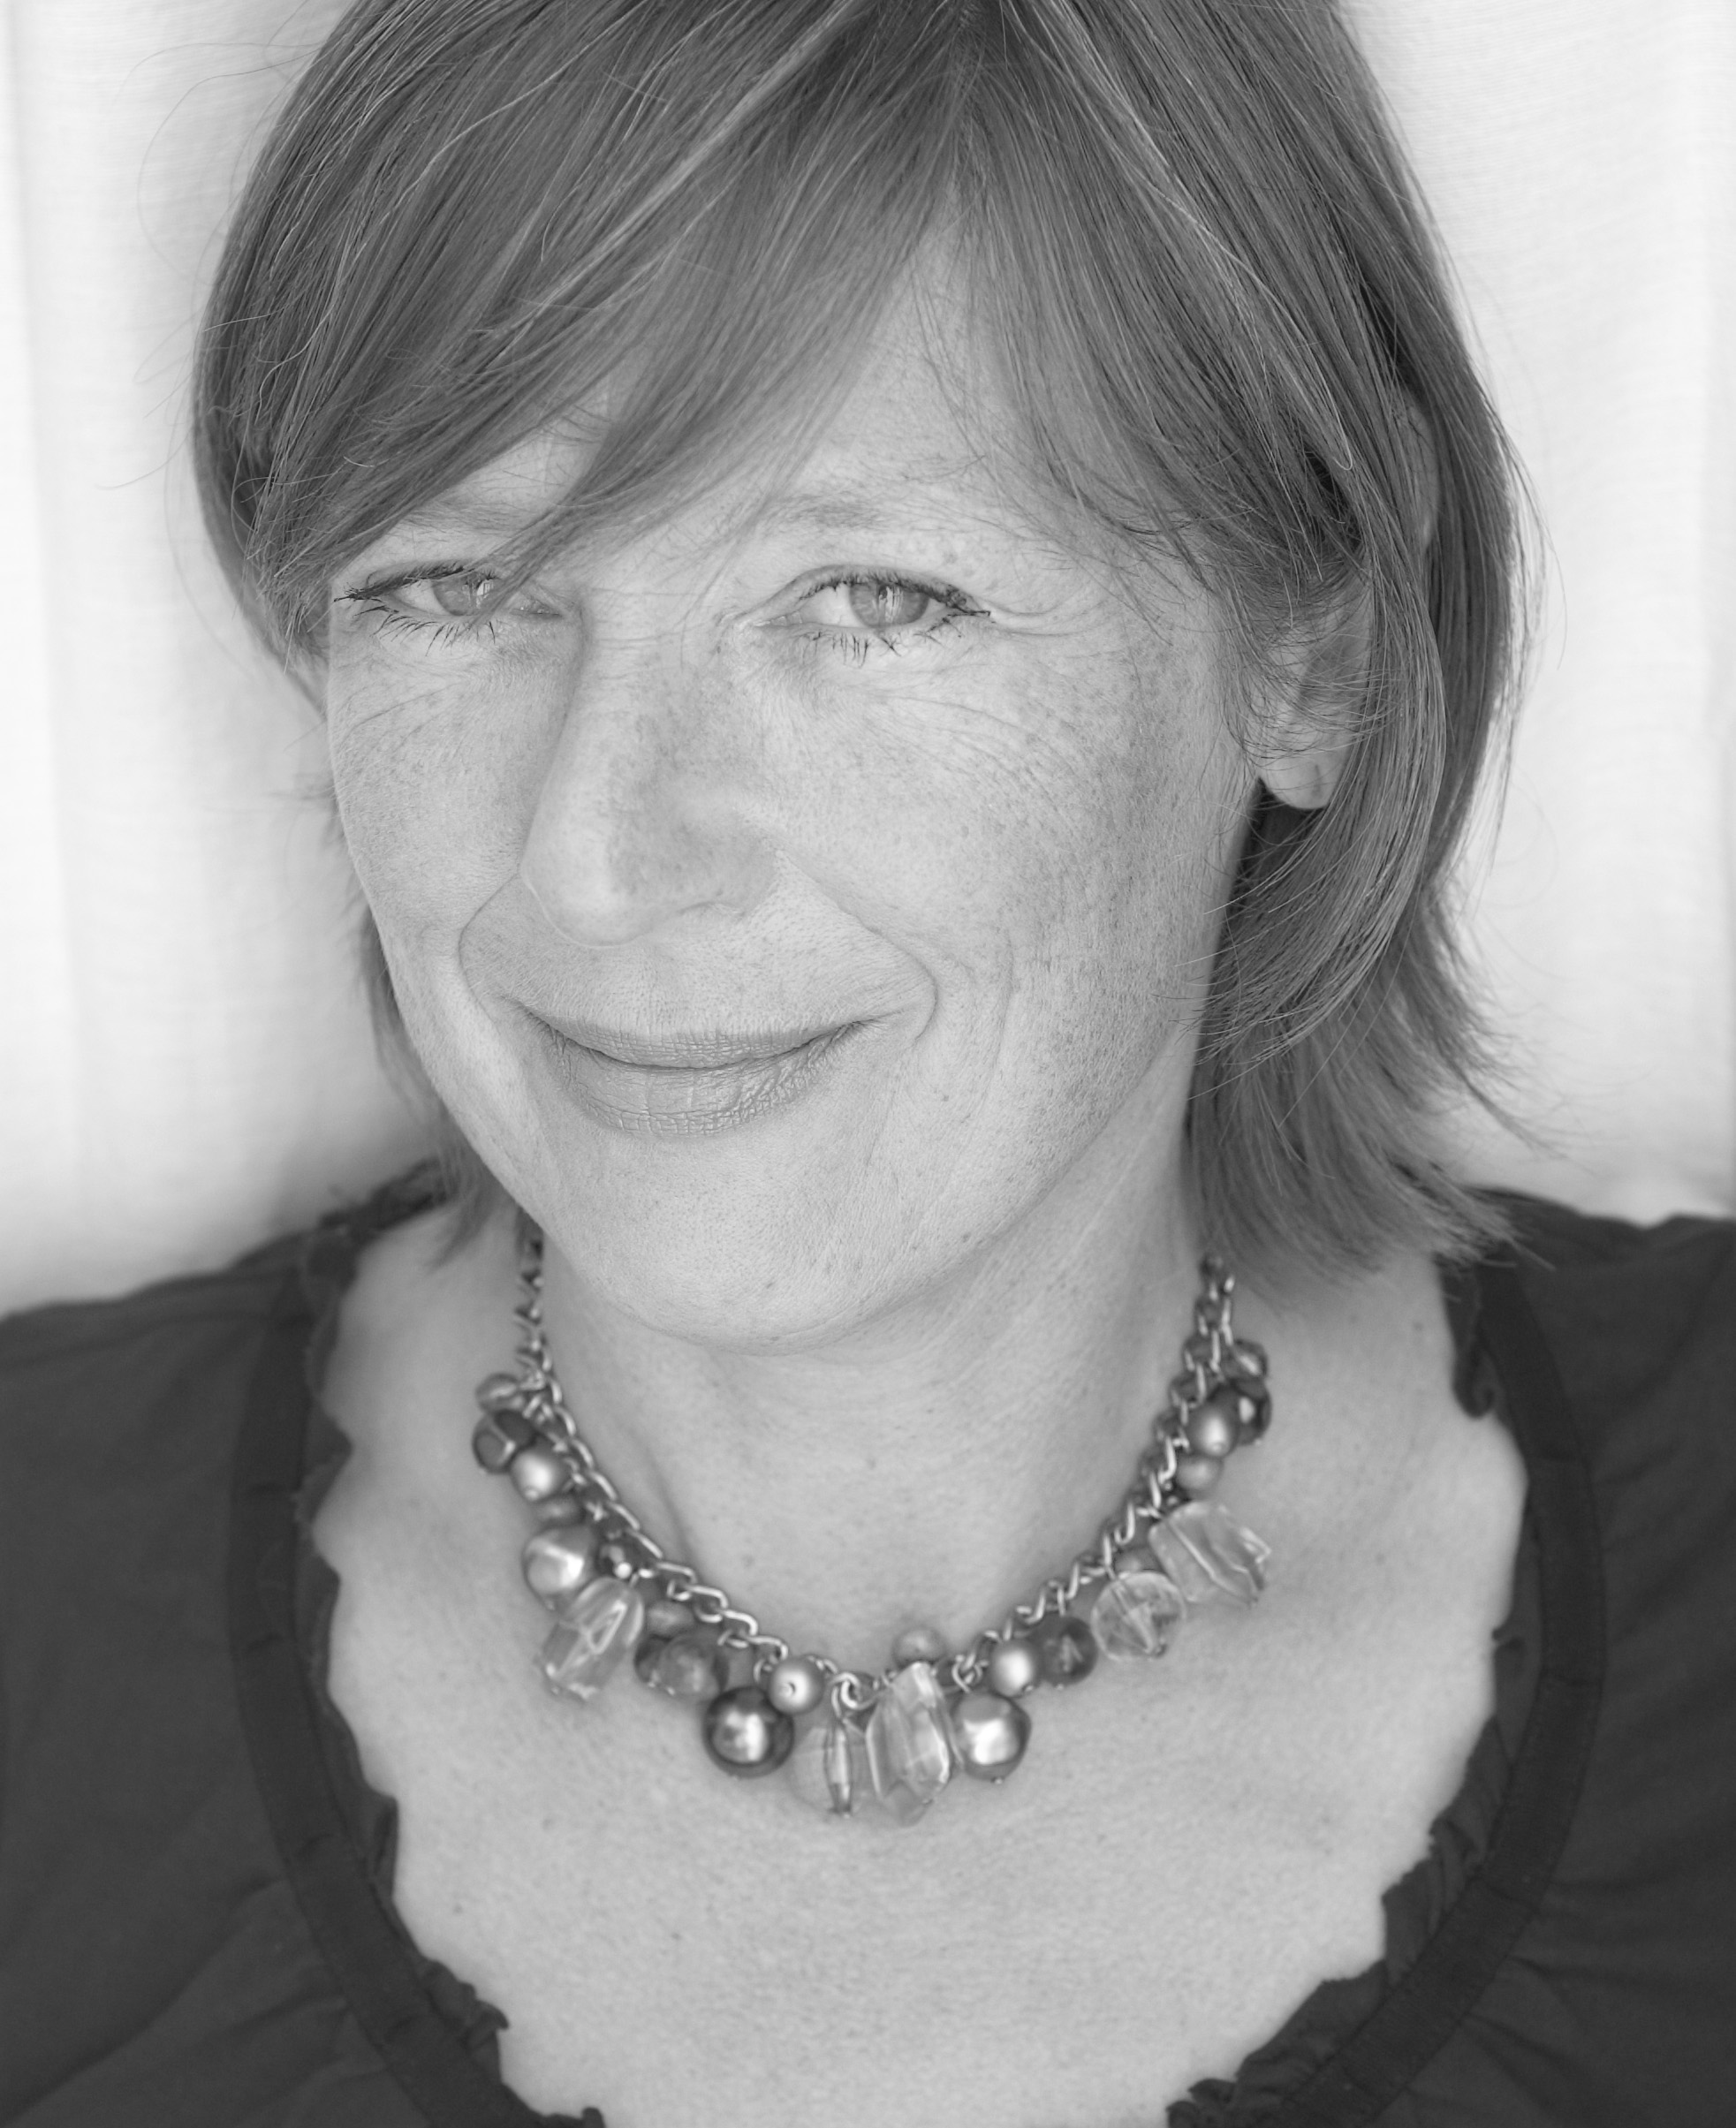 Caroline Stacey Responsesource Freelance Journalist Profiles